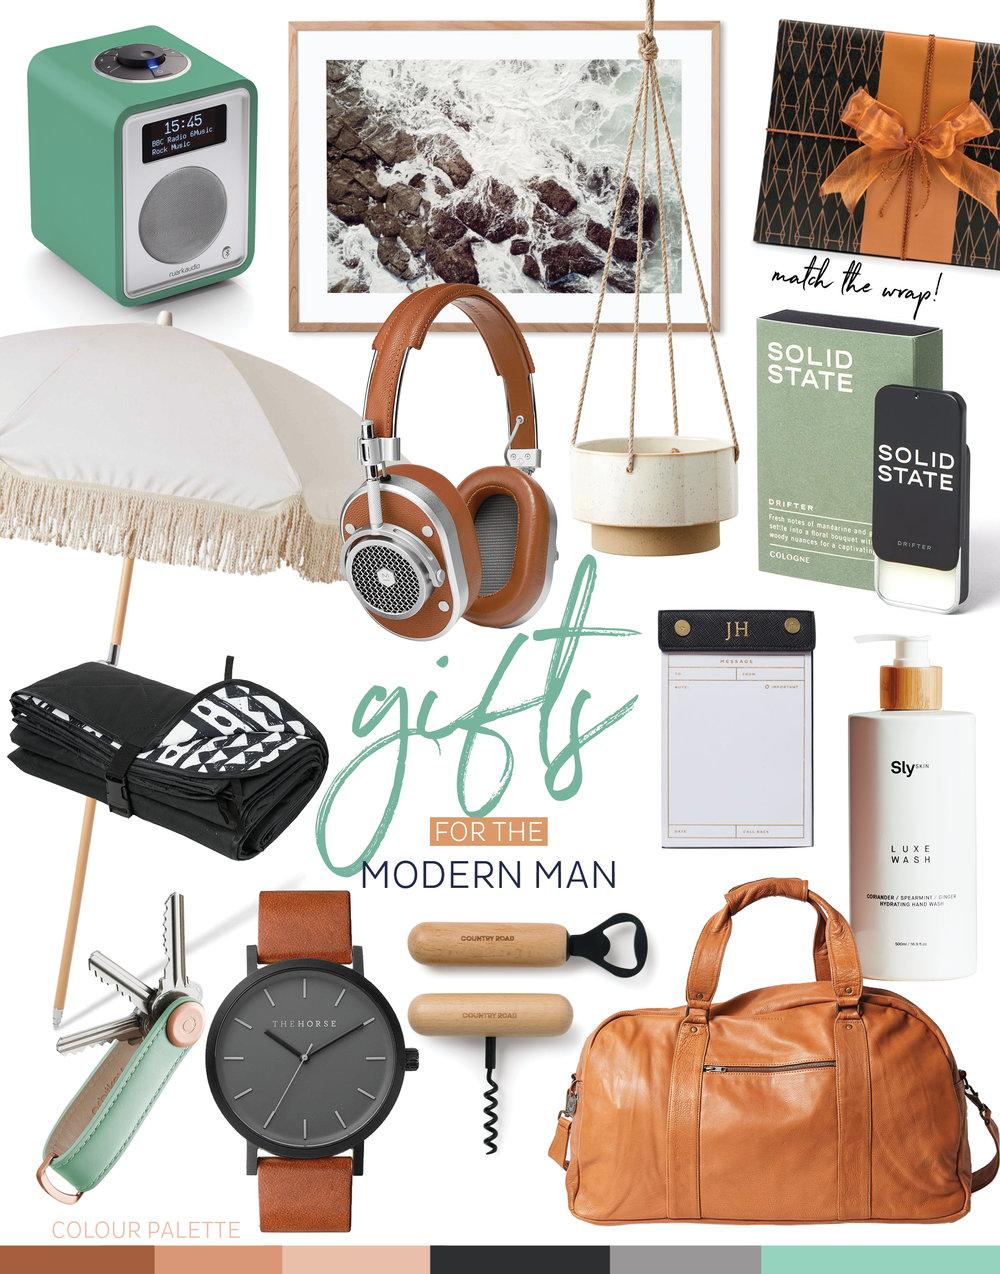 adore_home_magazine_christmas-gift-guide_modernman.jpg